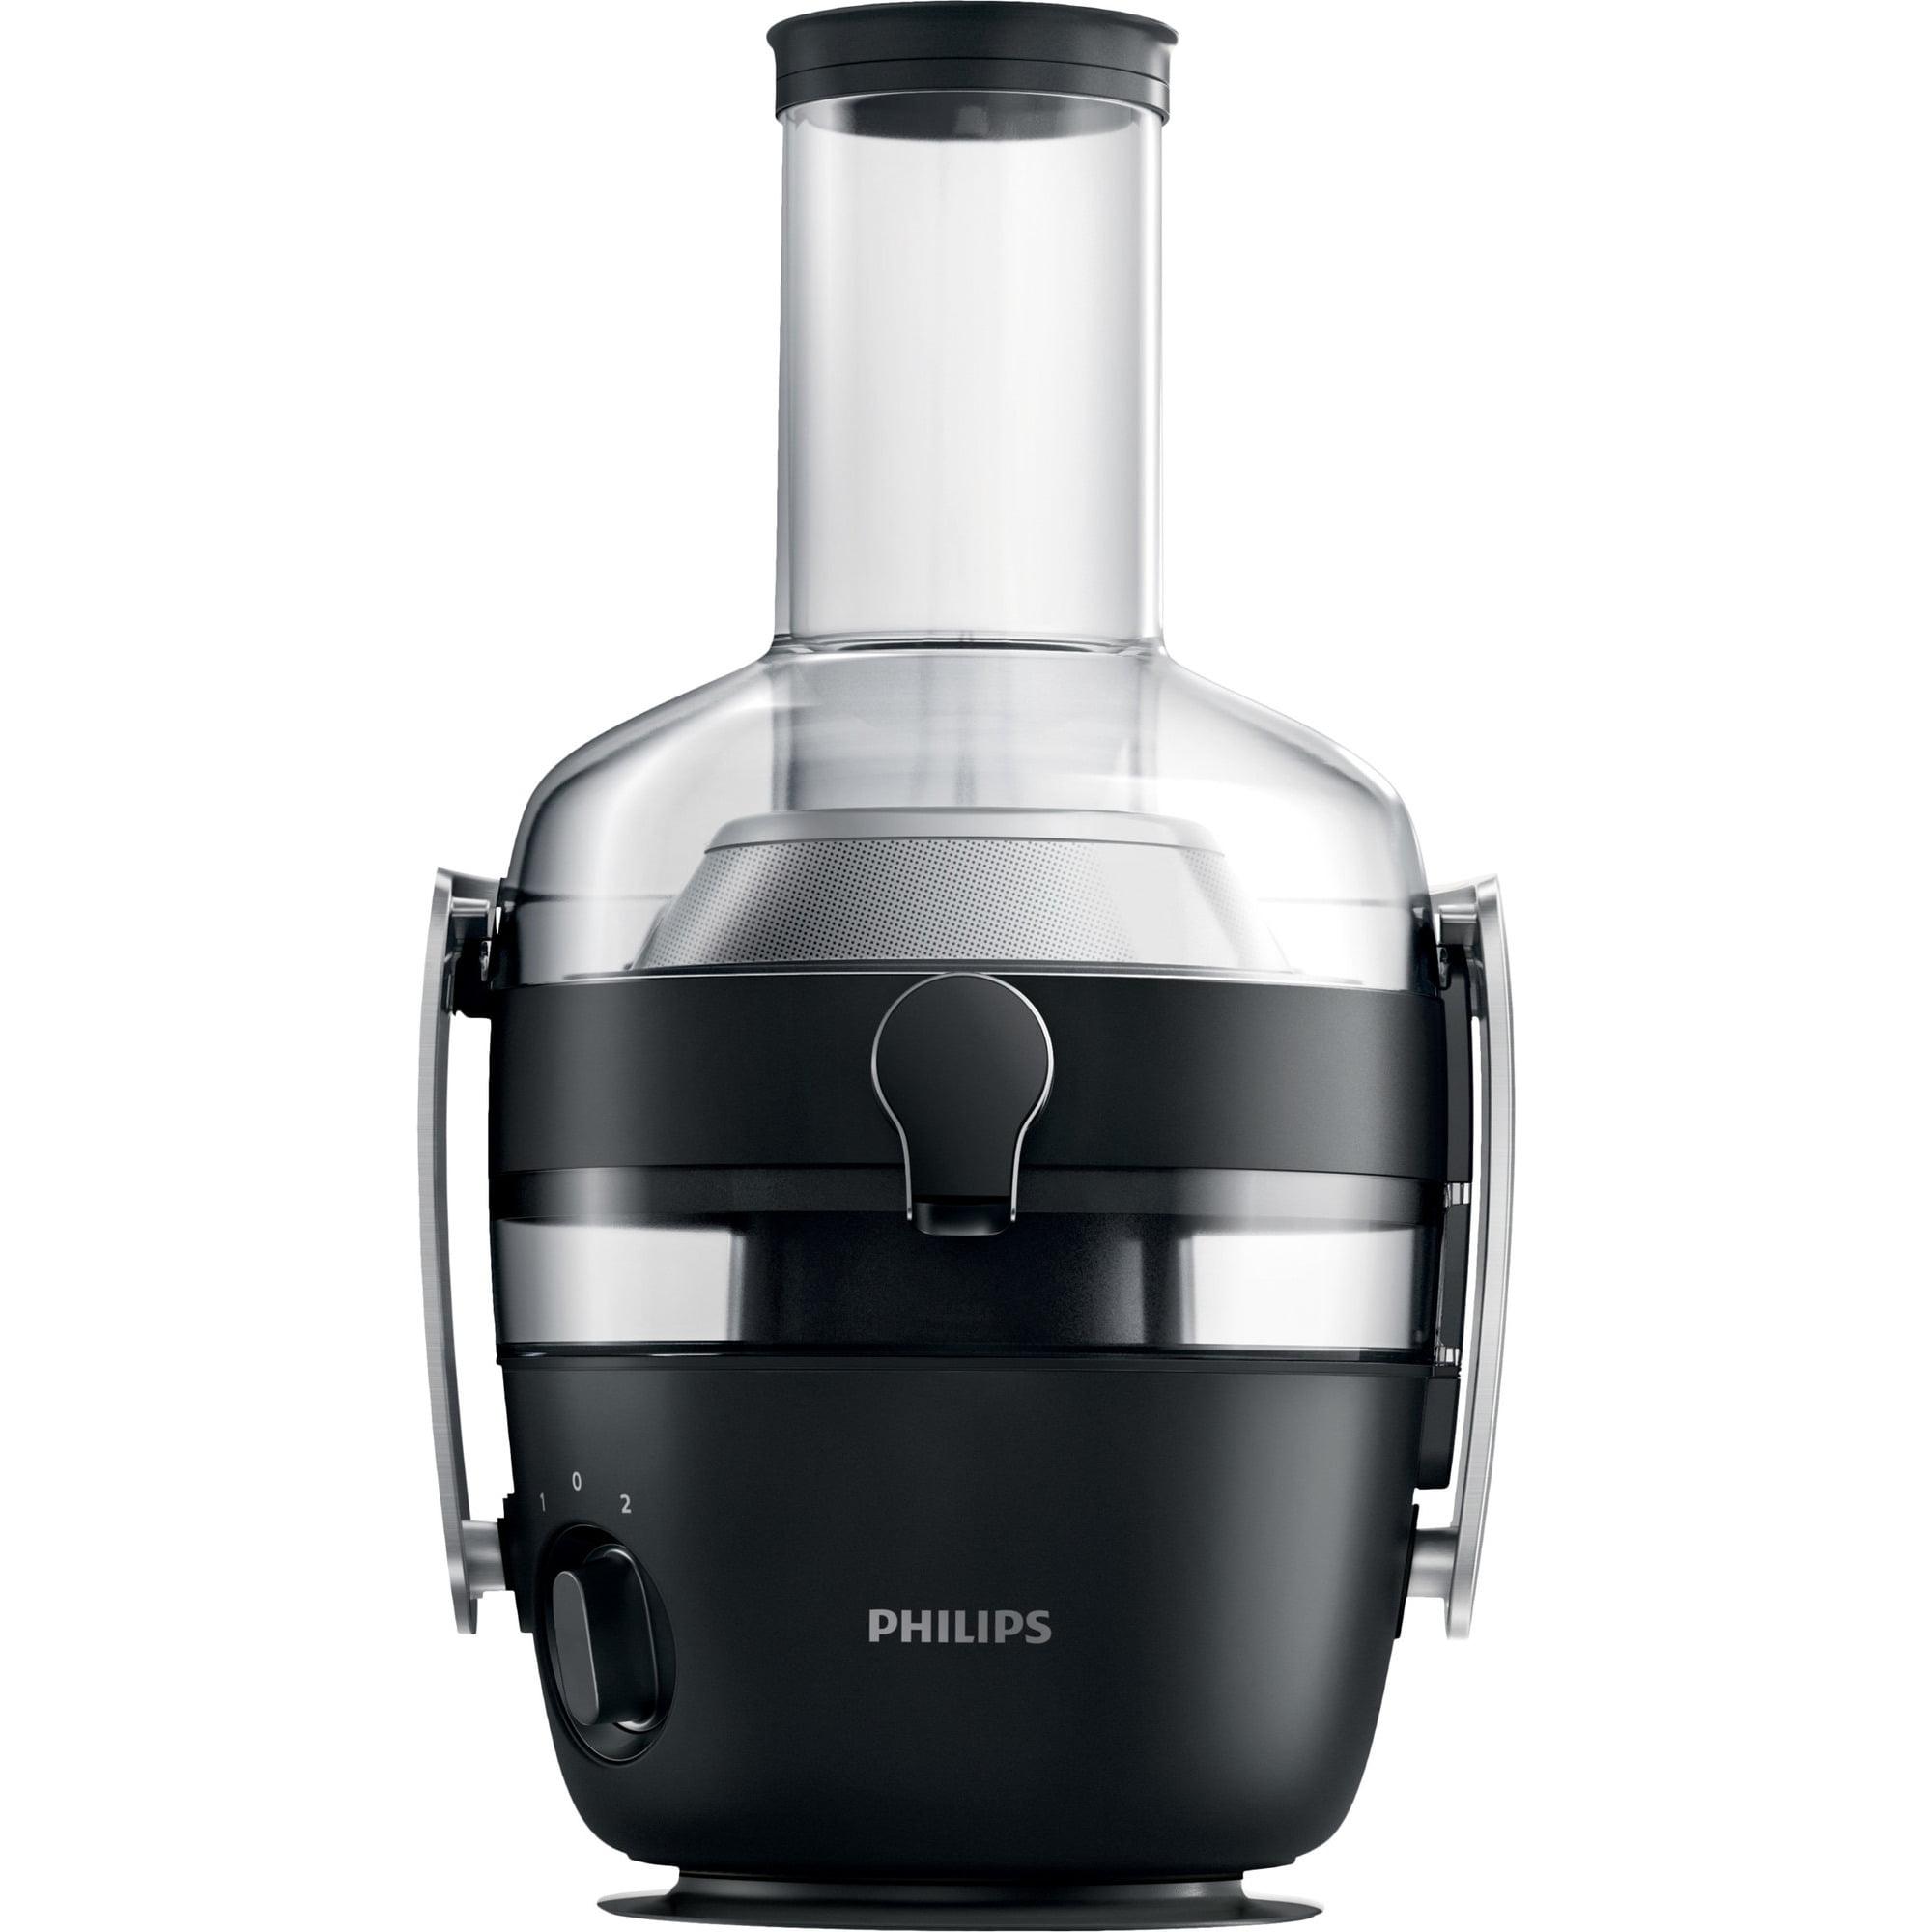 Philips HR1916/70 Avance Juicer